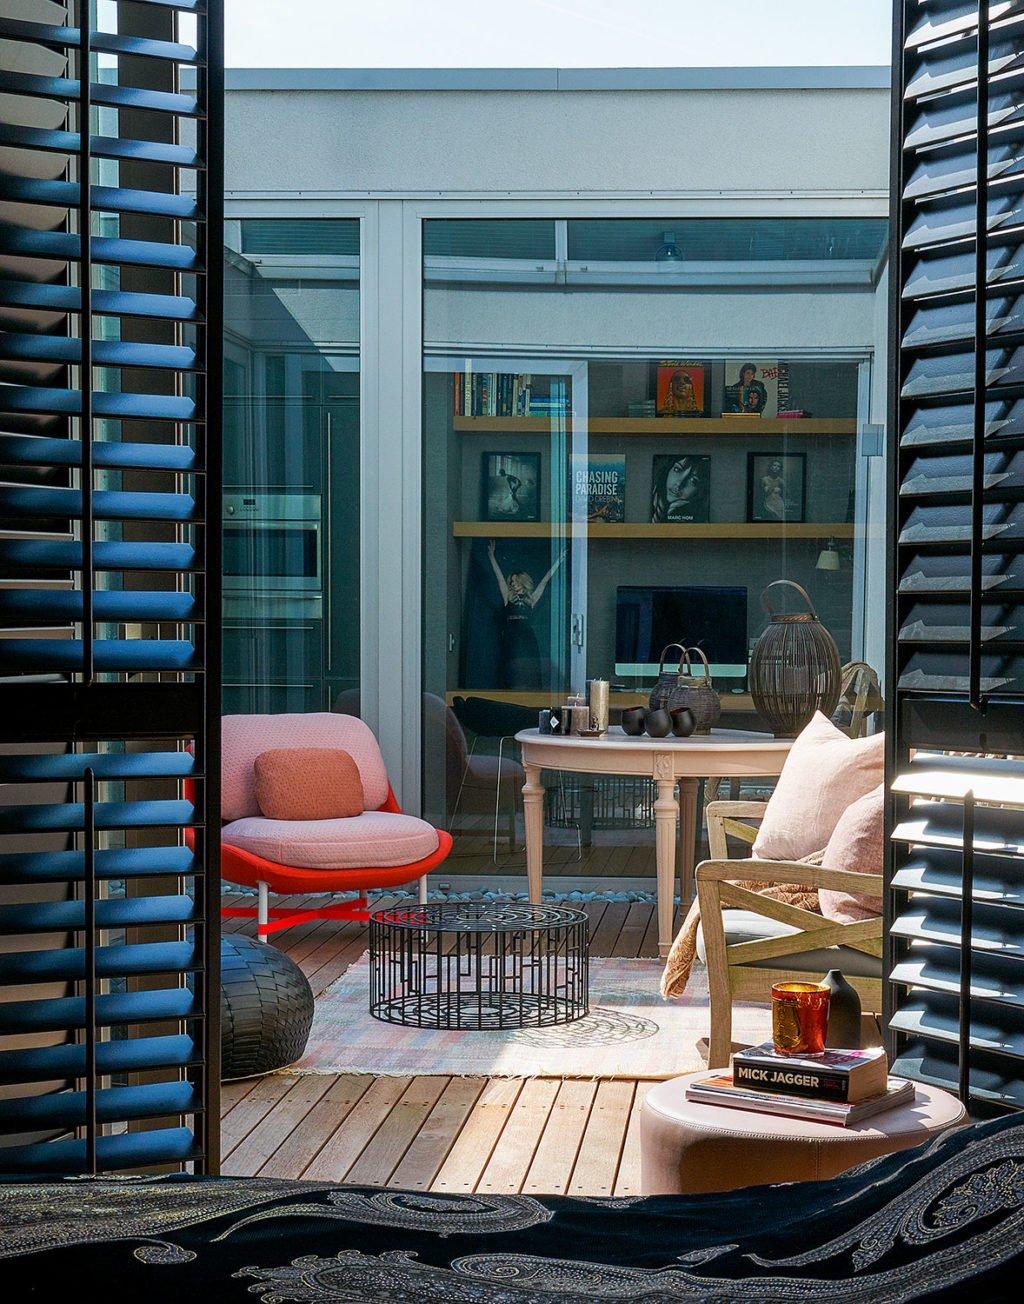 dutch interior design ouside wooden porch